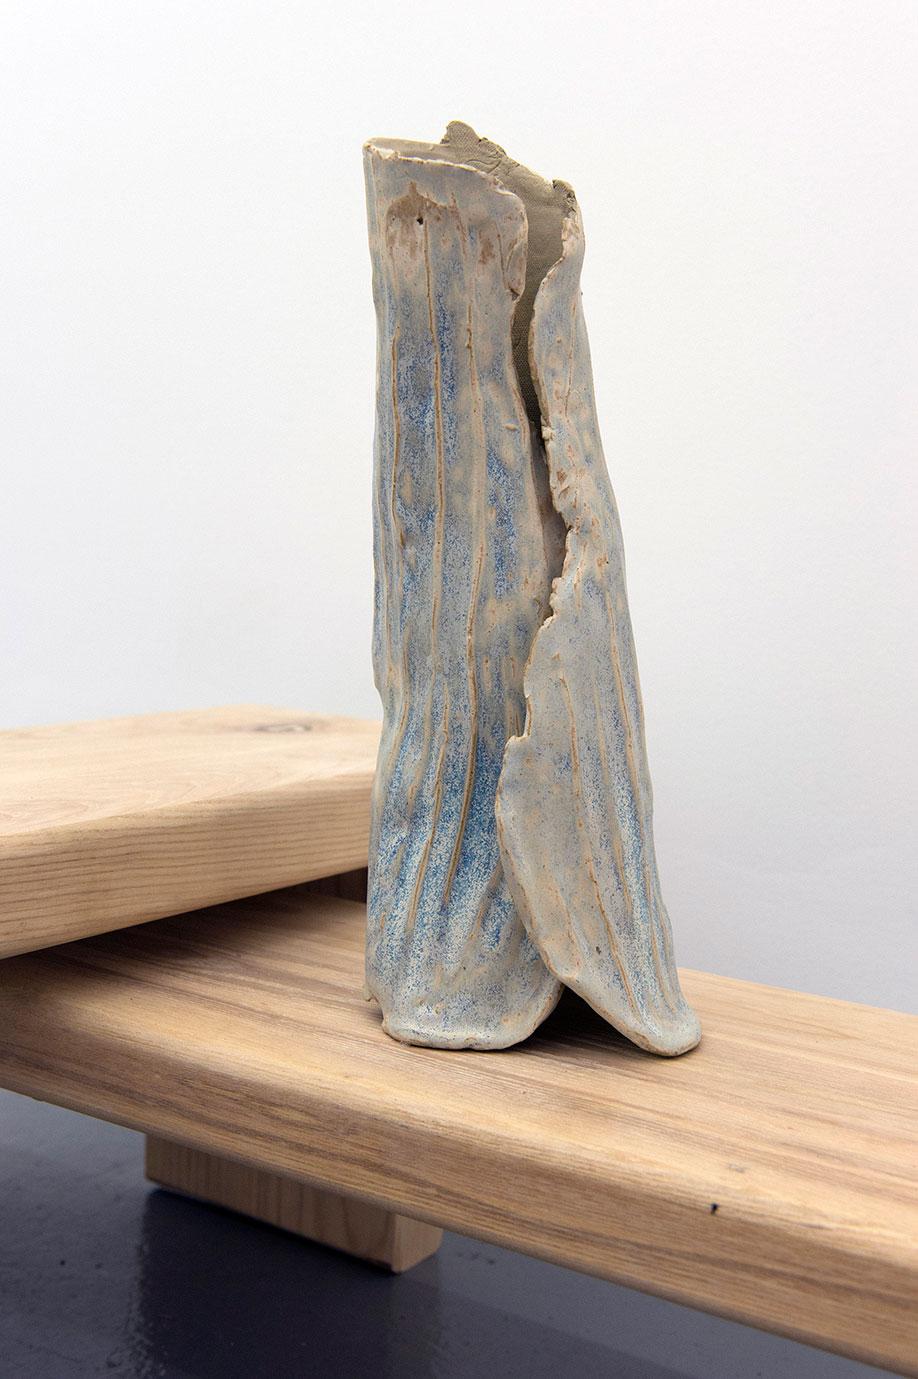 <b>Title:</b>Leg Retainer (Onus)<br /><b>Year:</b>2015<br /><b>Medium:</b>Ceramic<br /><b>Size:</b>32 x 13 x 12 cm